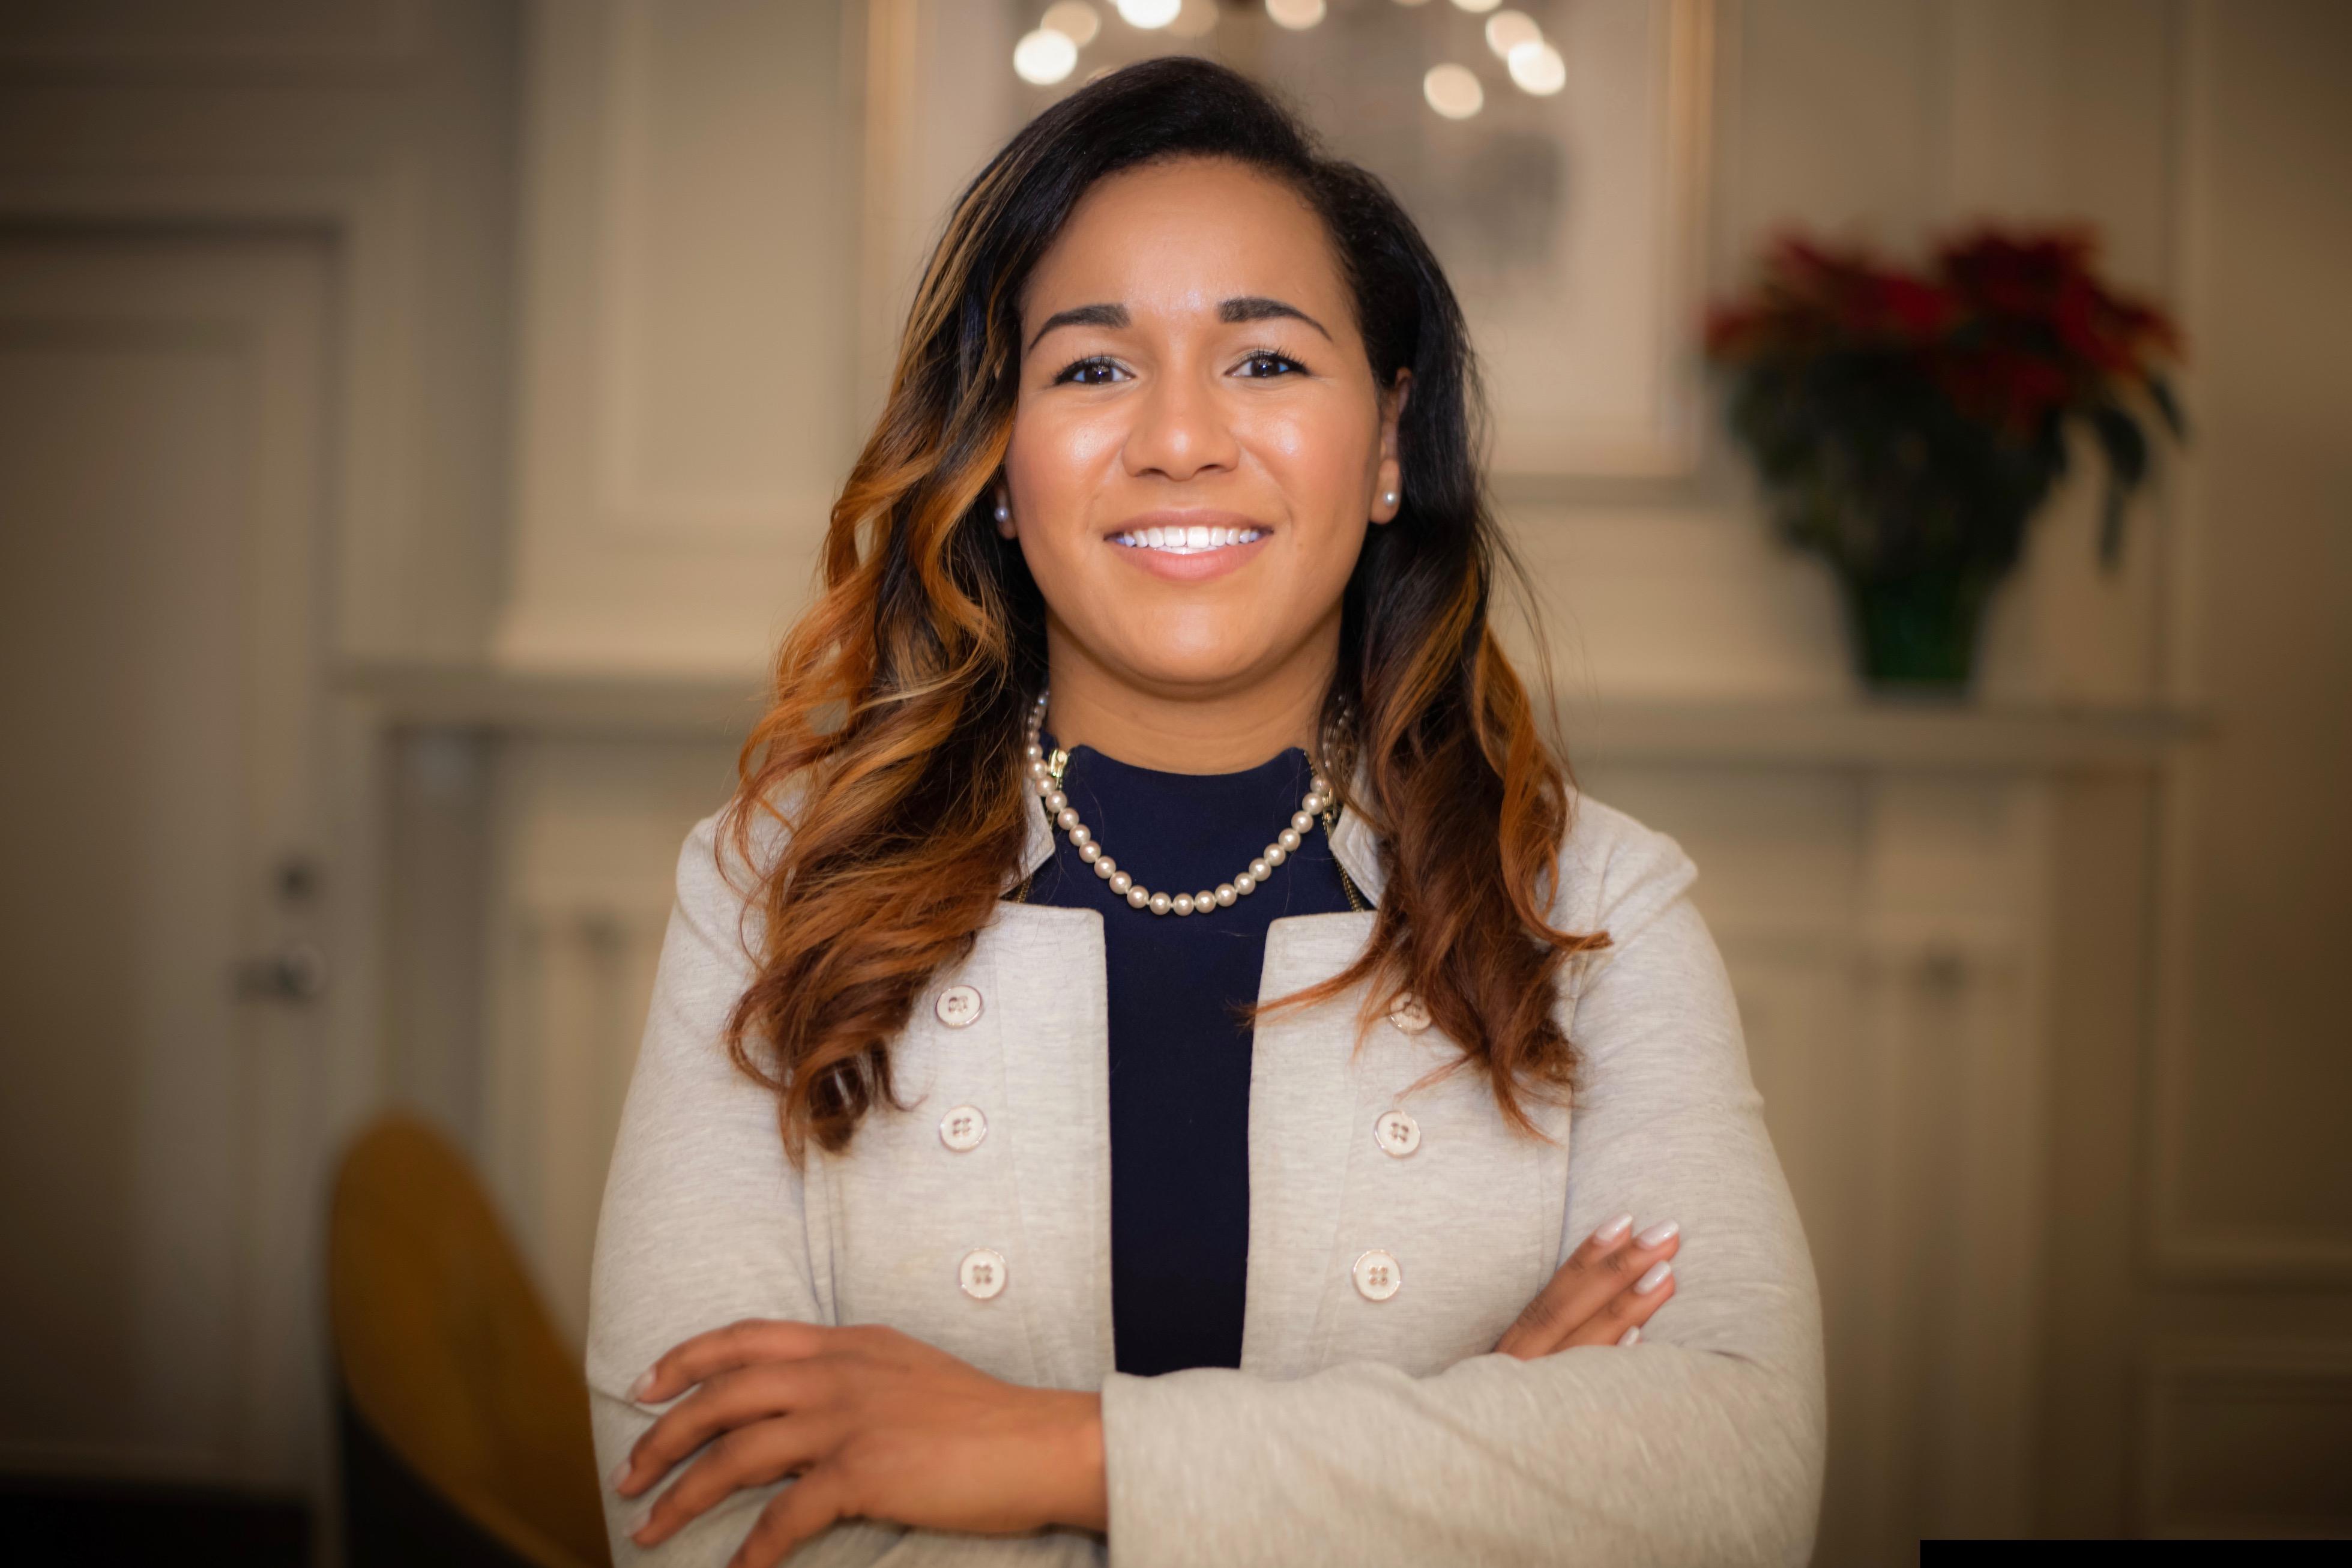 Meet Tiffany Alexander, 27, administrator of a pediatrics urgent